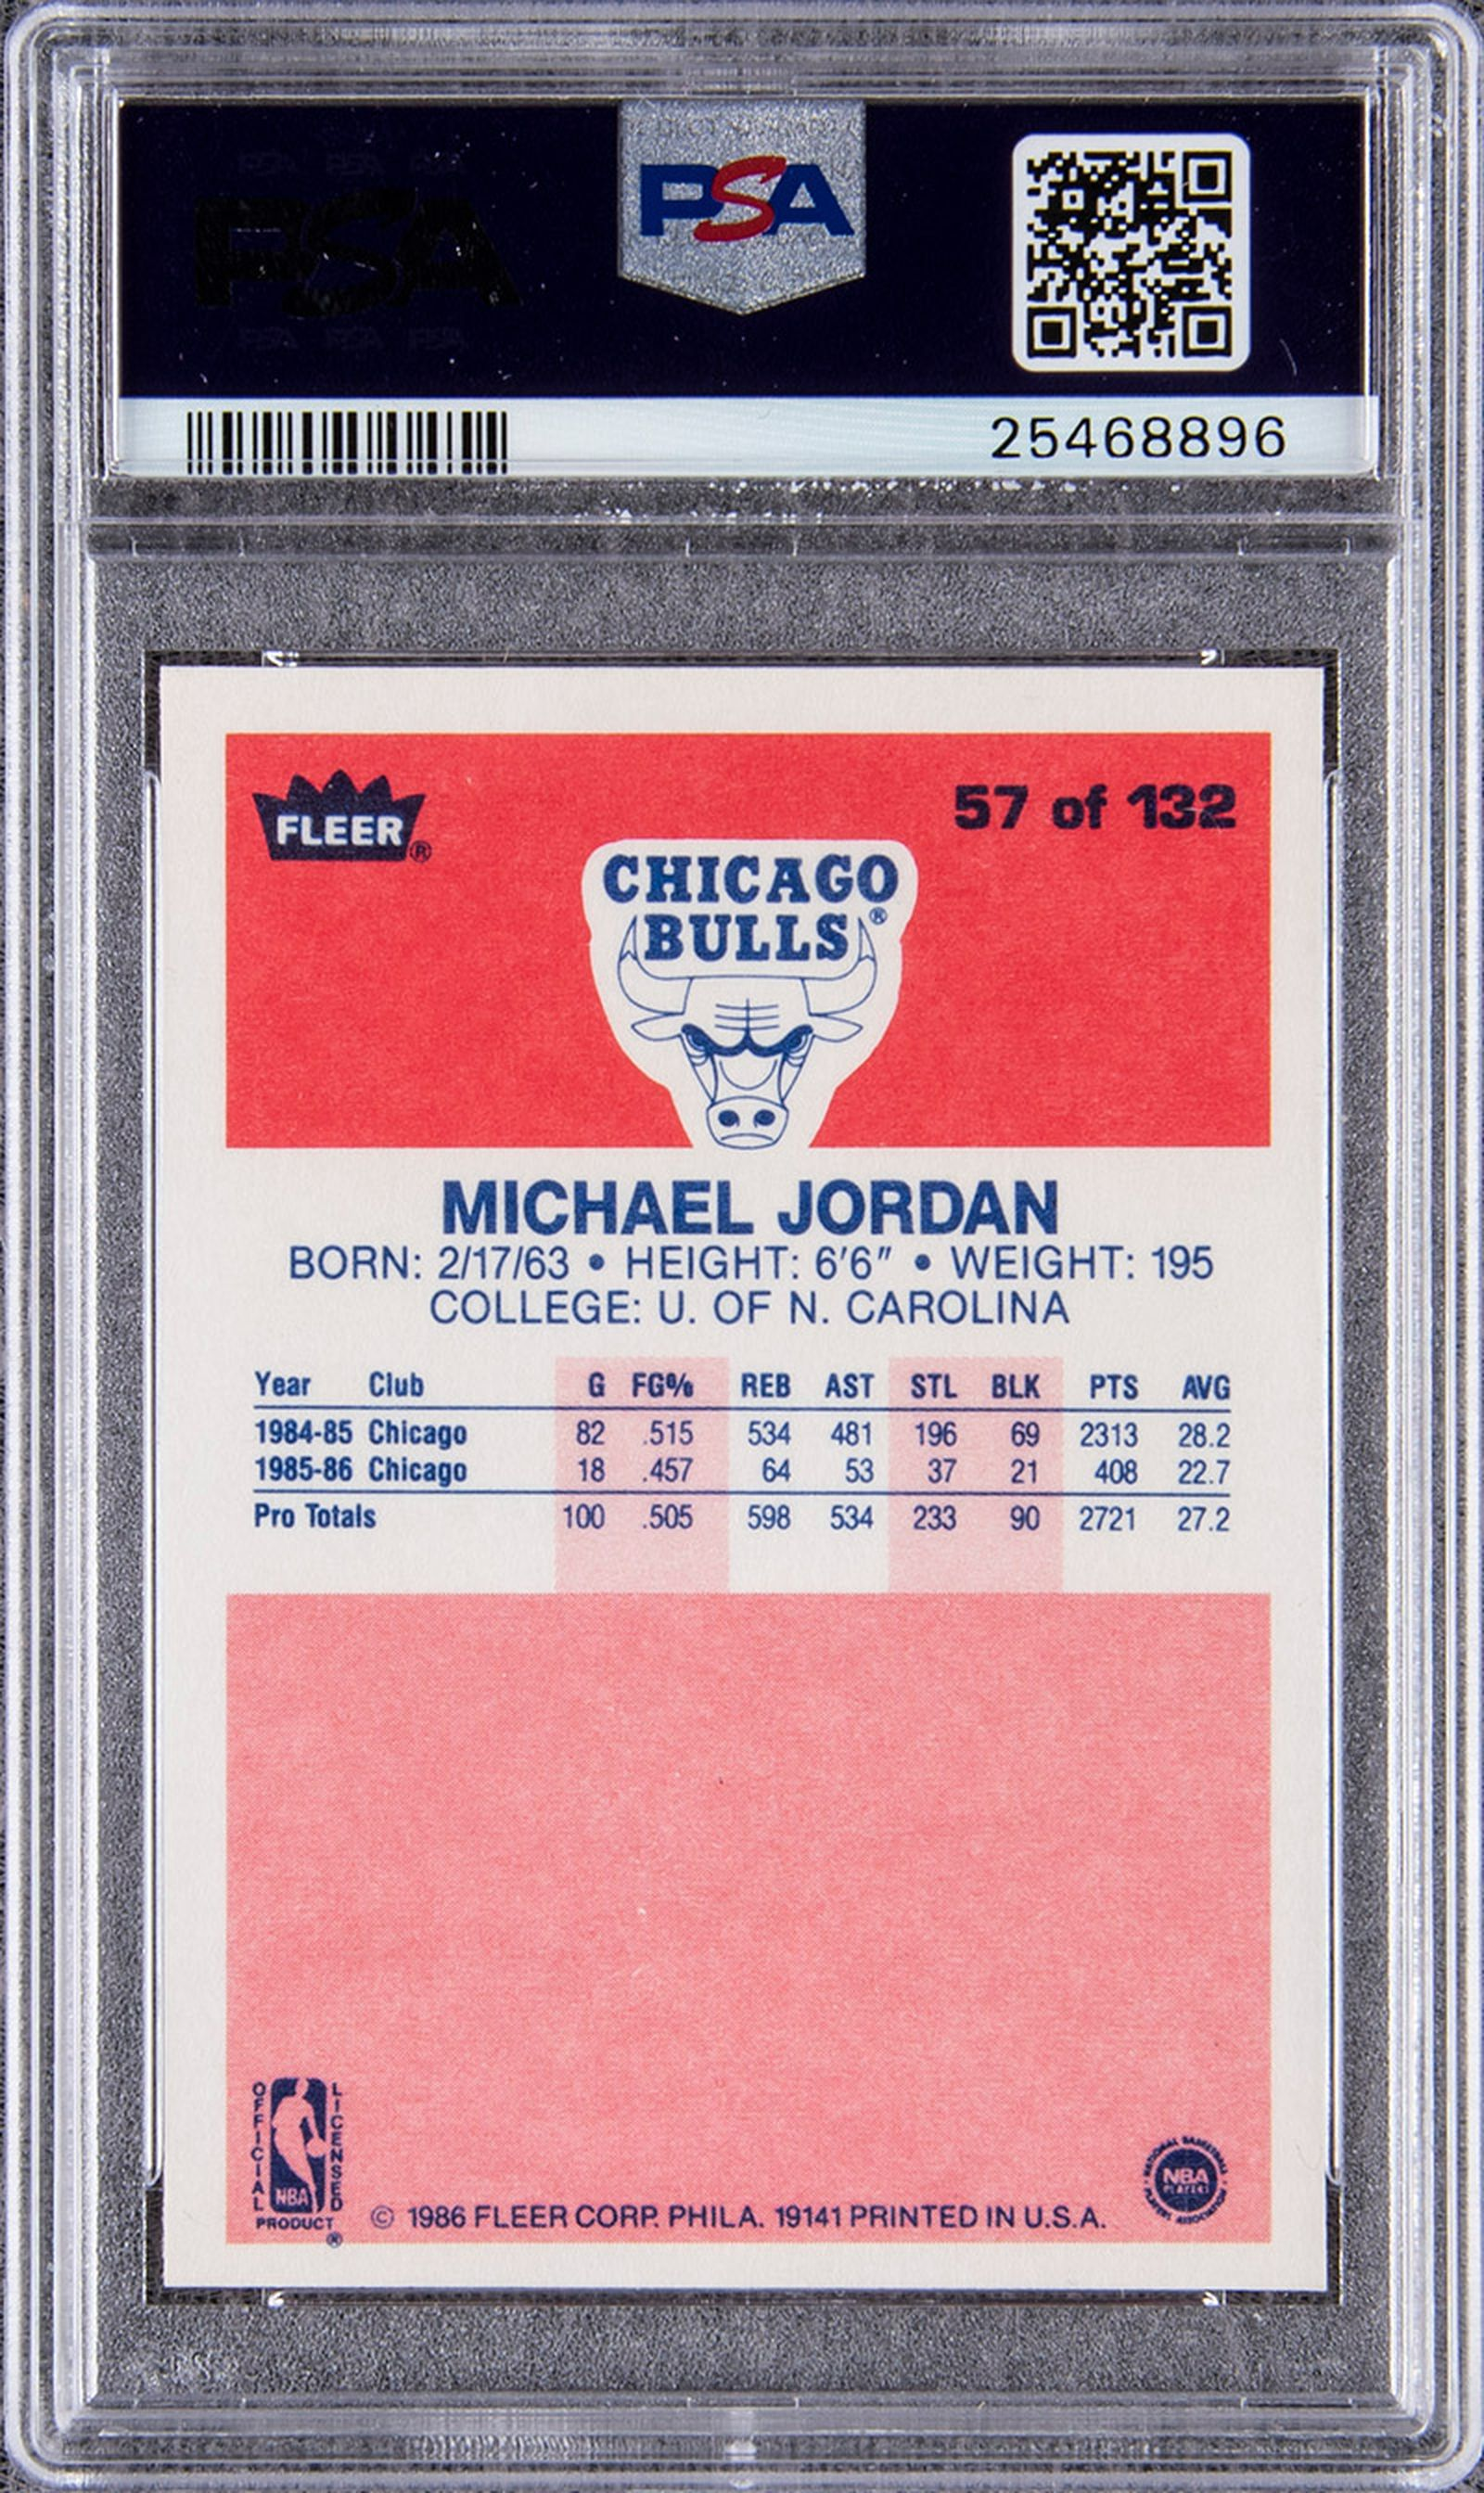 michael-jordan-rookie-card-sets-auction-record-04